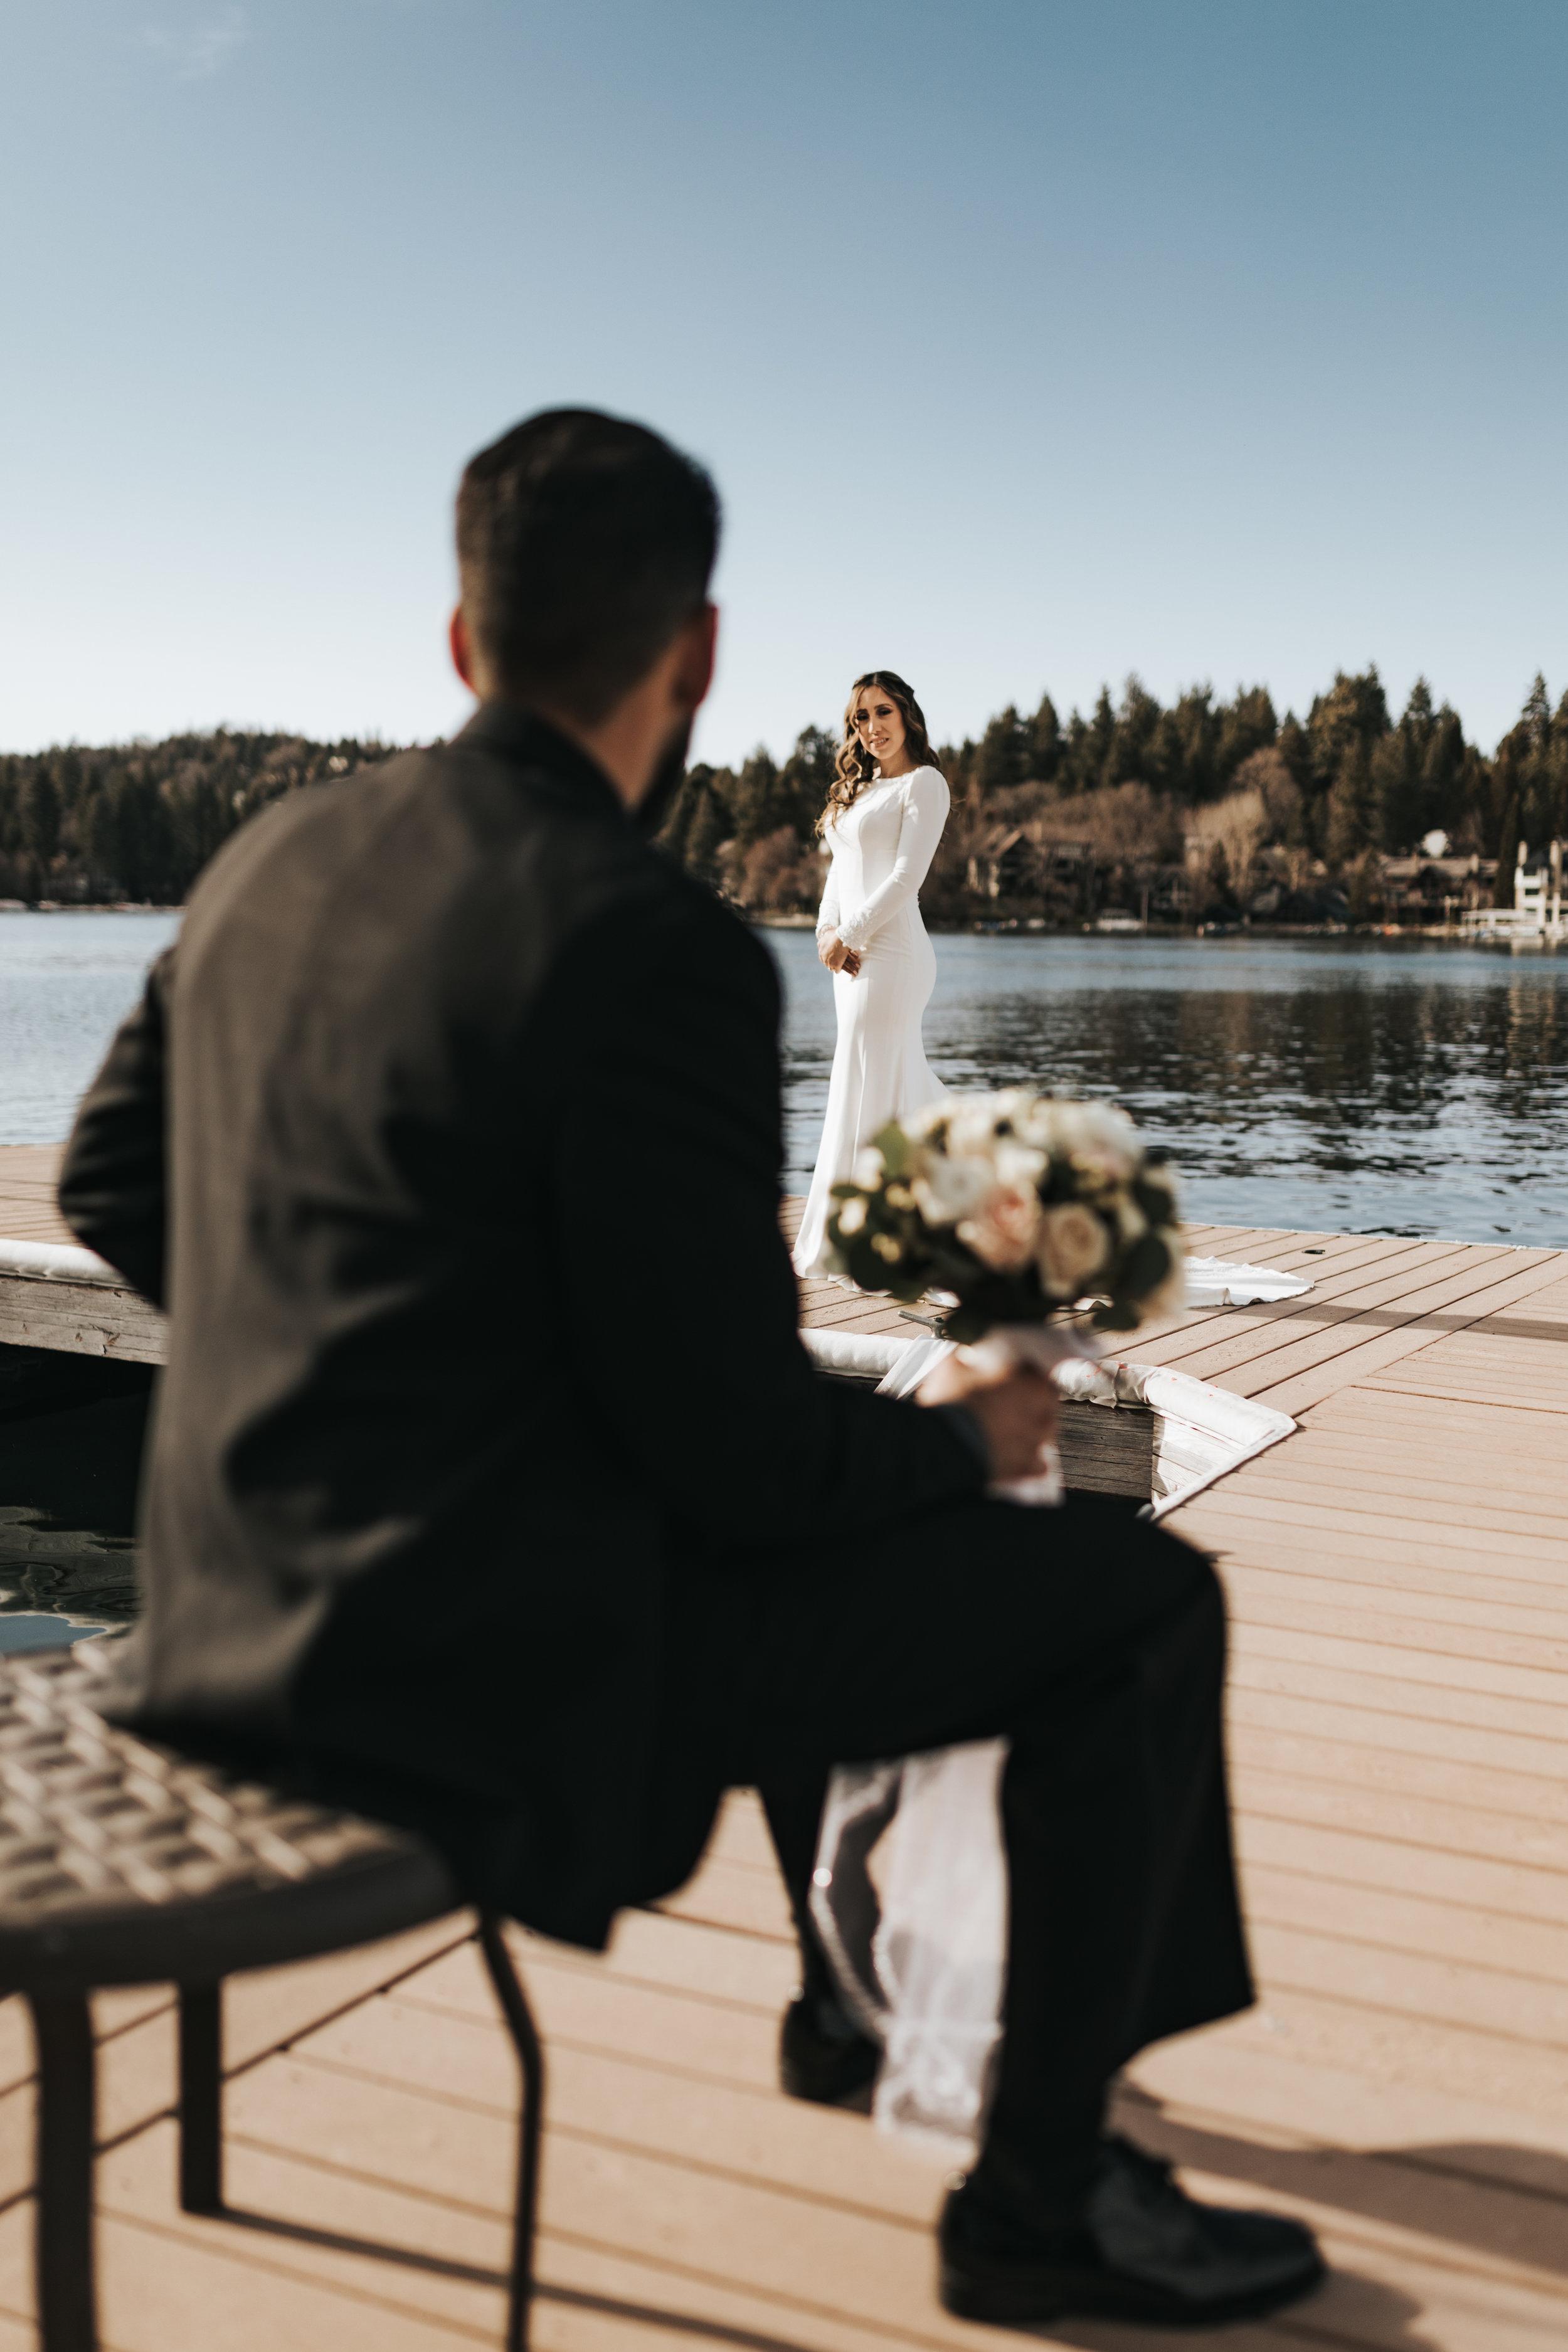 K+K Lake arrowhead intimate wedding (18).jpg